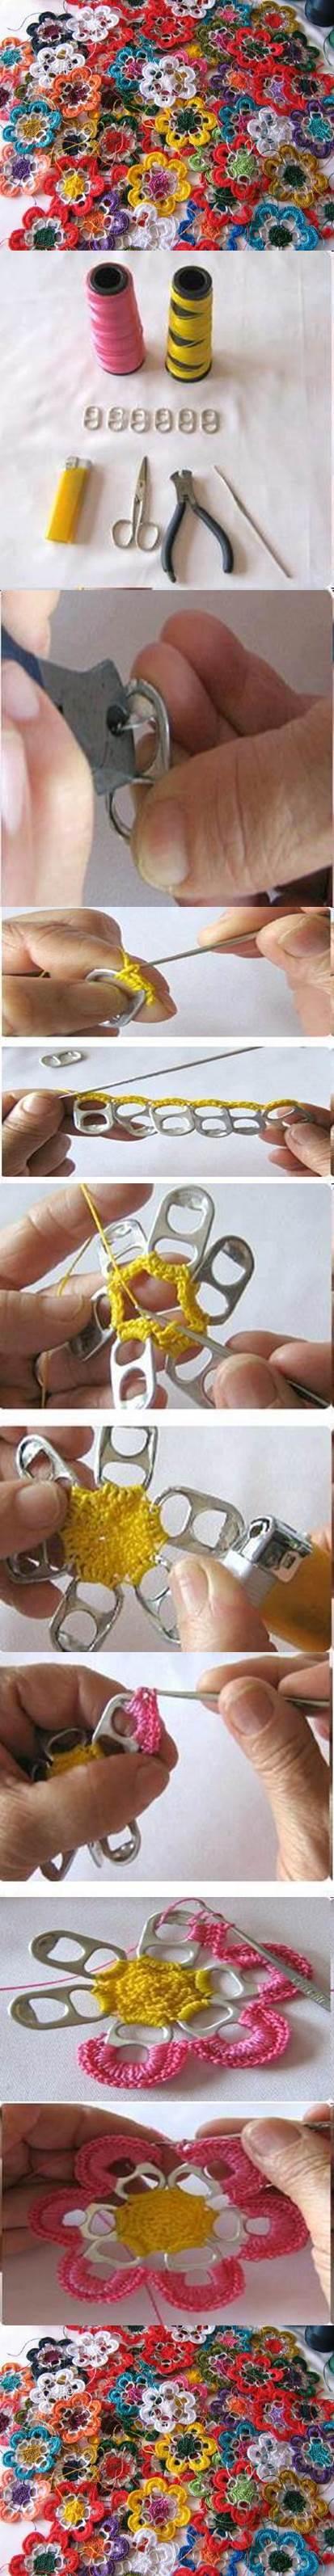 DIY-Pull-Tabs-Crochet-Flowers-2